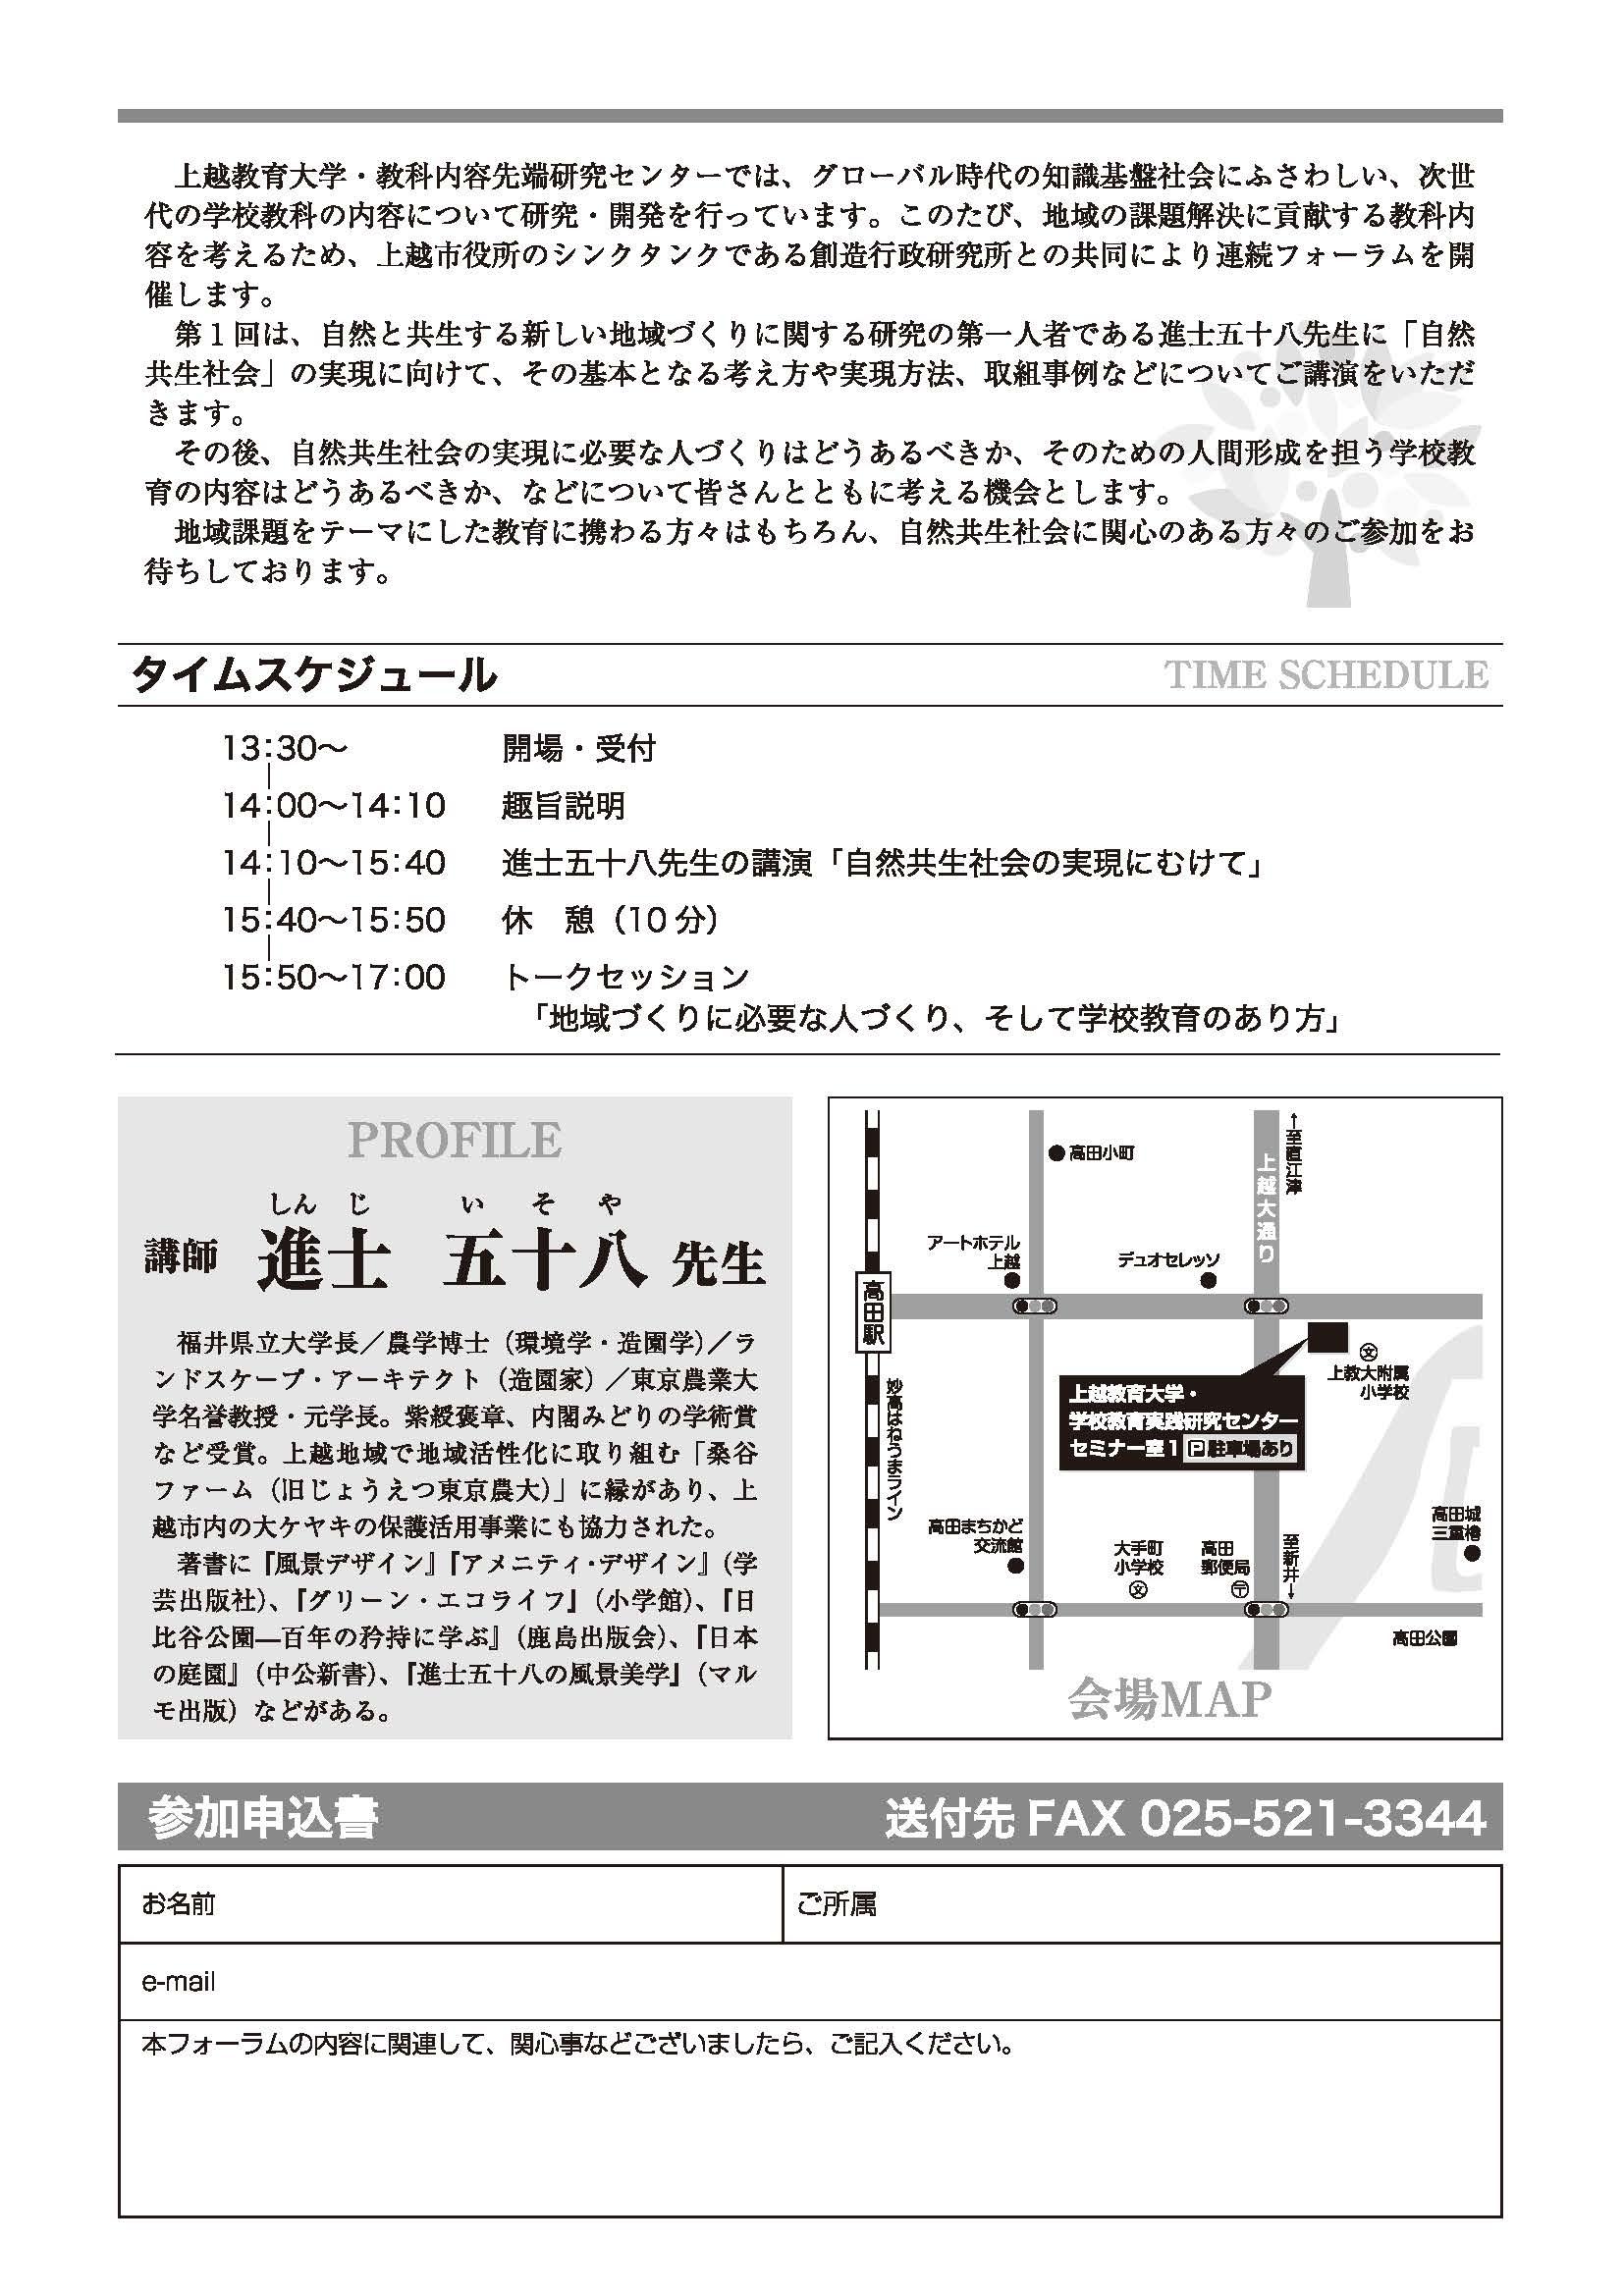 20200208_forum01_1.pdf_ページ_2